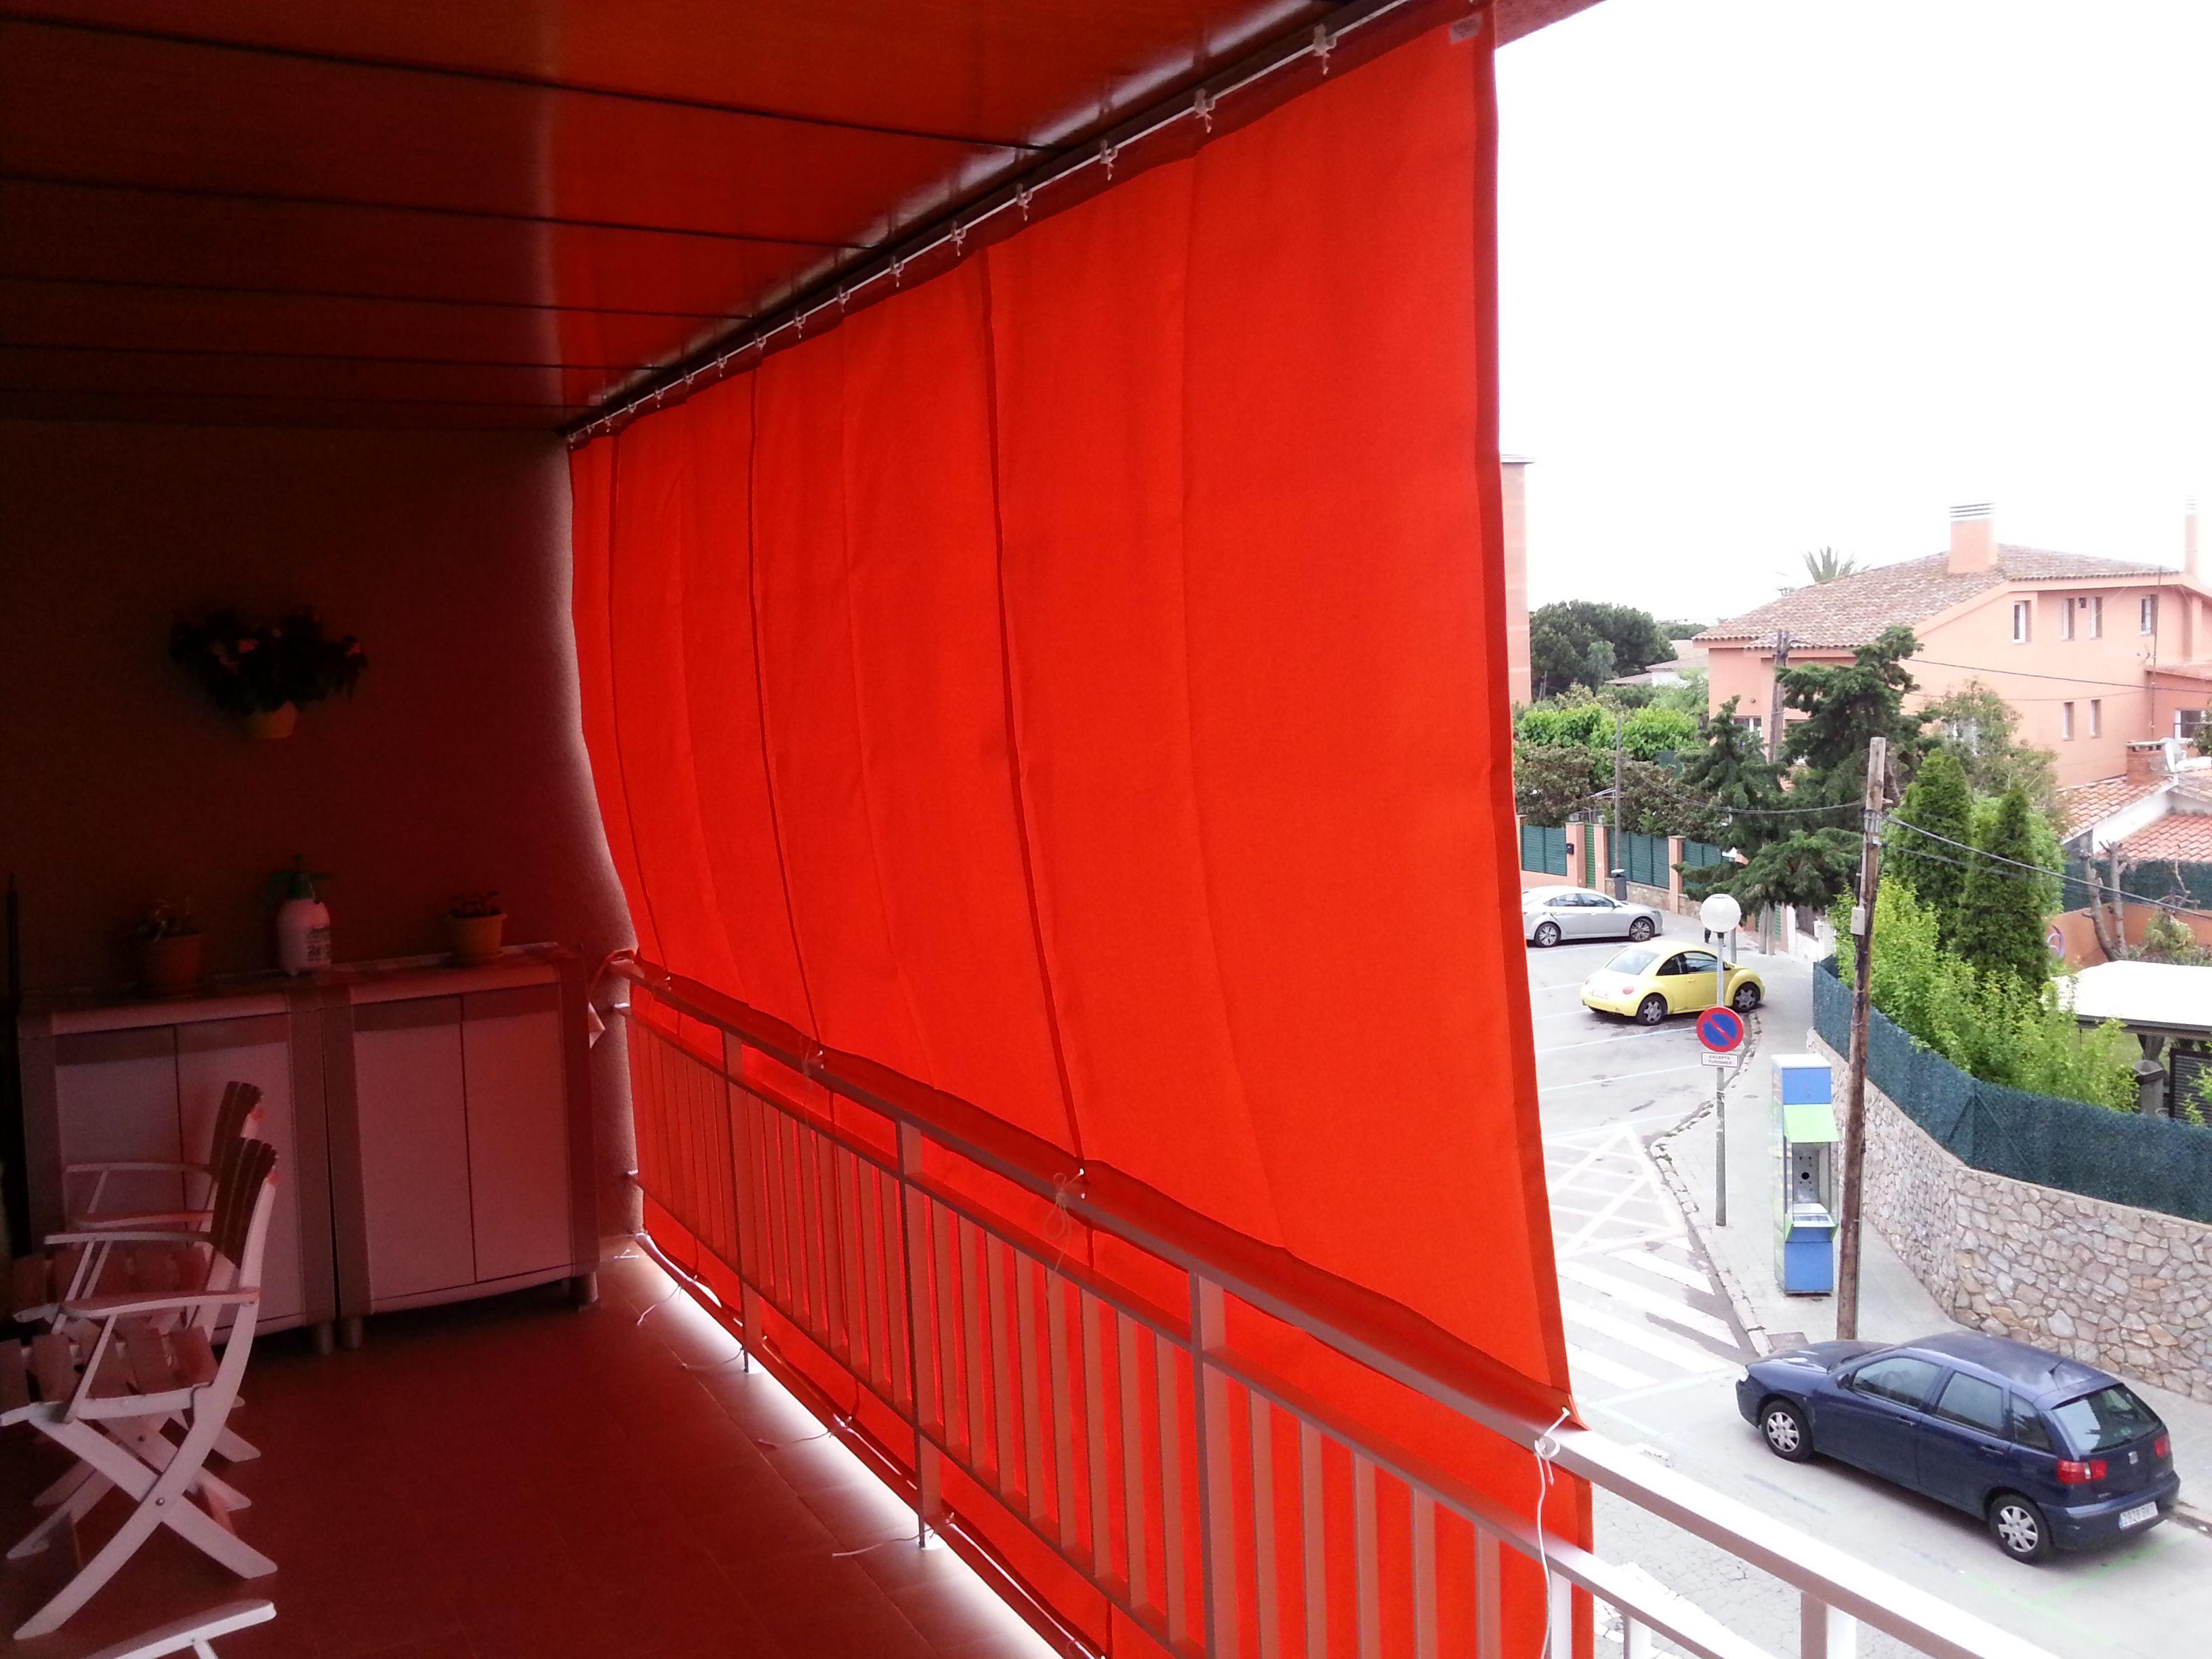 Toldo tipo cortina corredera para balcones toldos para - Toldos para patios precios ...